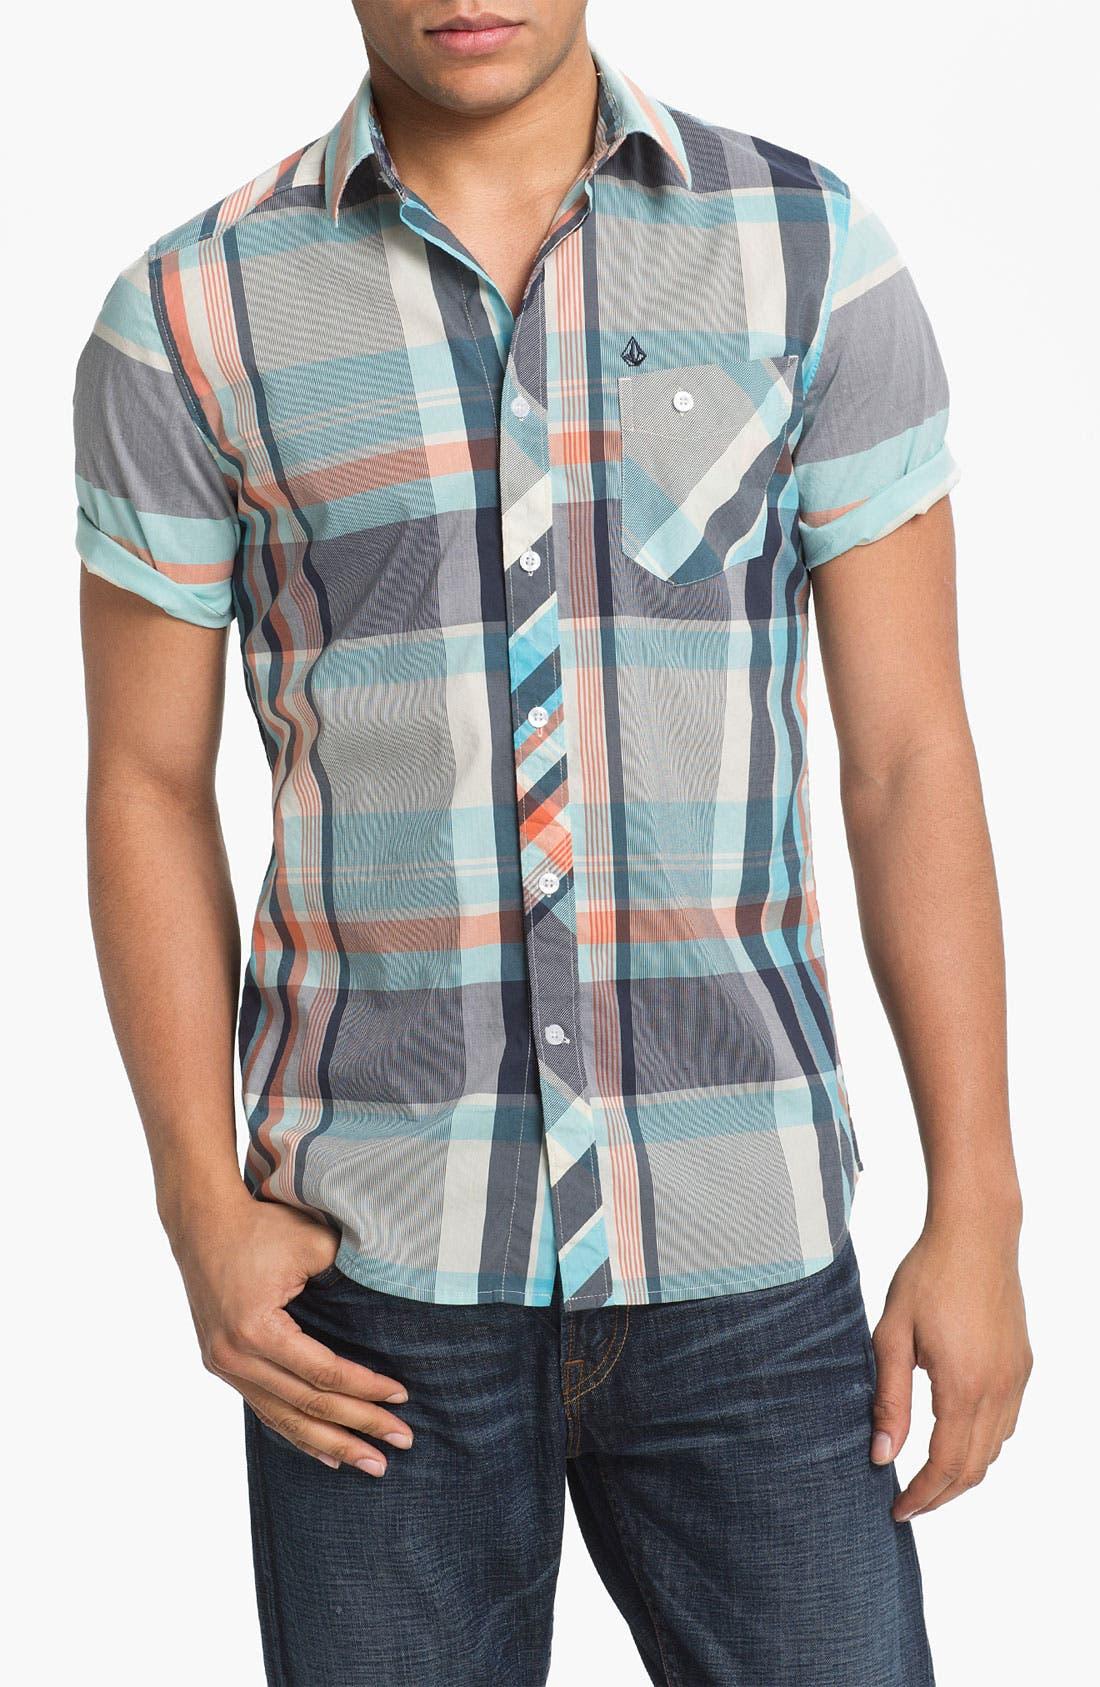 Main Image - Volcom 'Lonsway' Plaid Woven Shirt